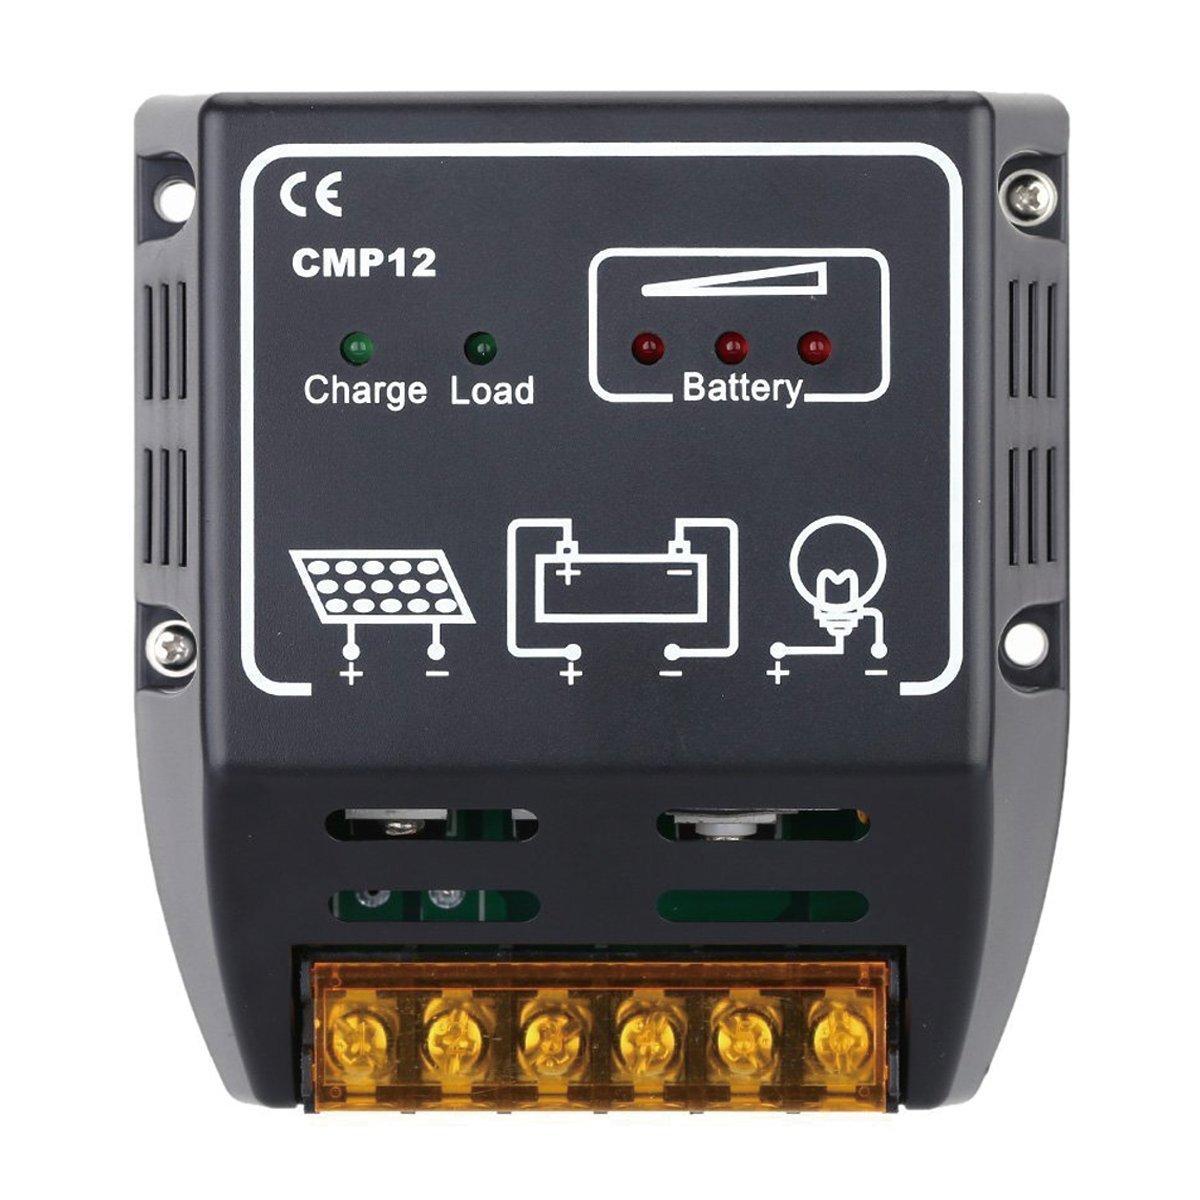 CURE(キュア) チャージコントローラー ソーラーパネル 10A 12V/24V ソーラーチャージャーコントローラー ソーラーチャージコントローラー 充放電 コンデン